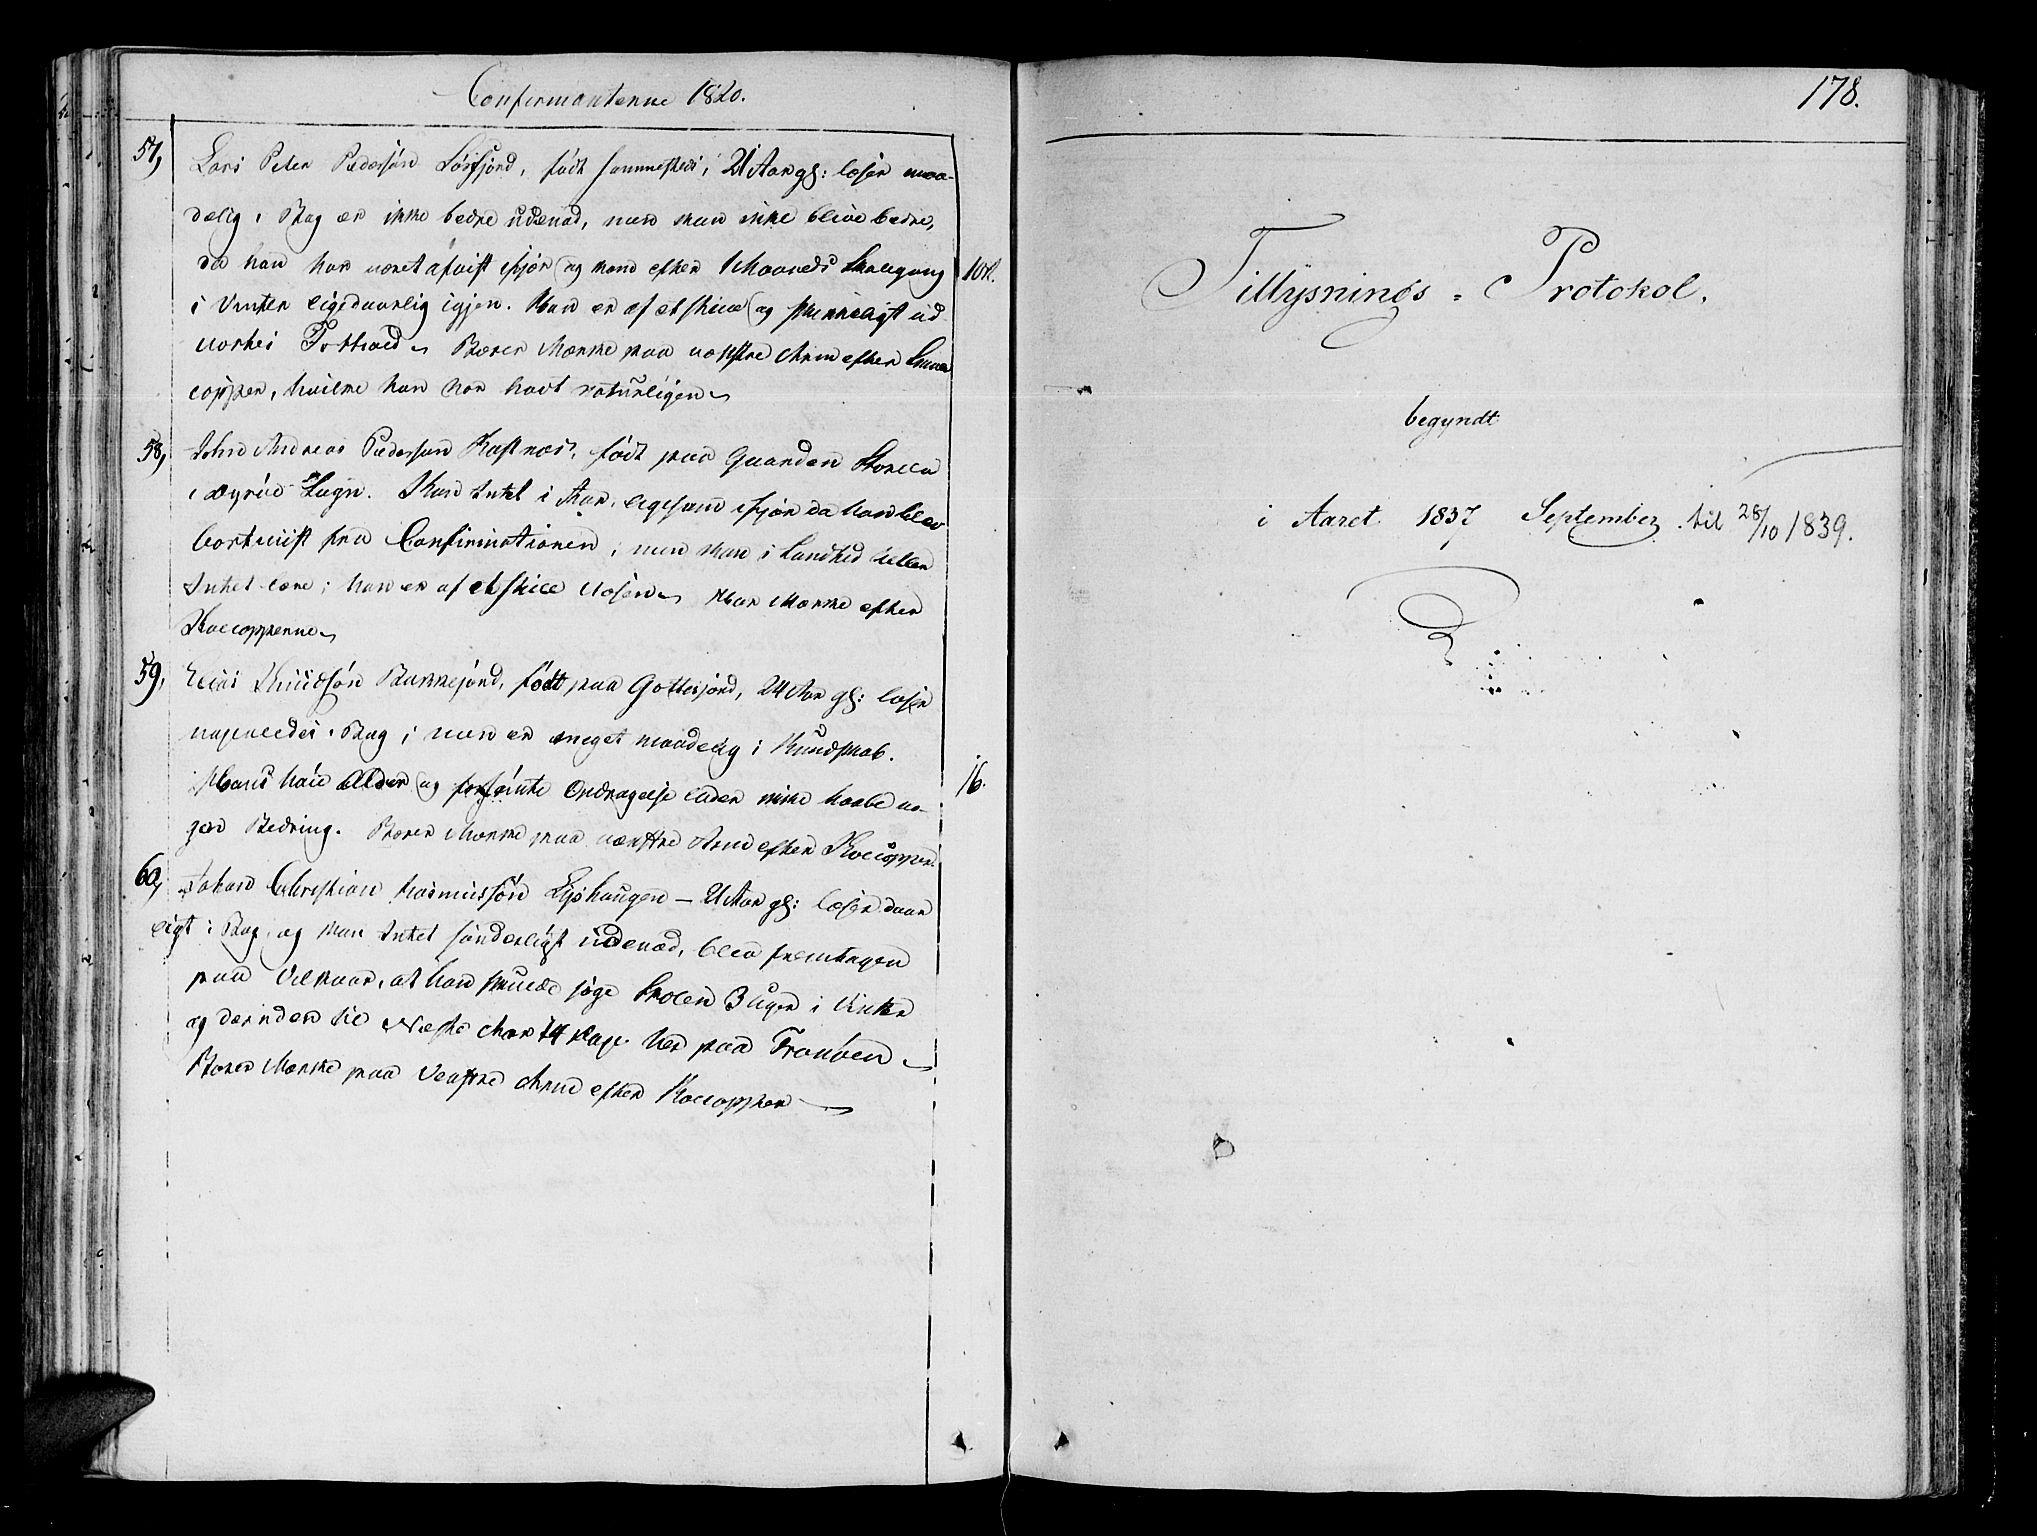 SATØ, Tranøy sokneprestkontor, I/Ia/Iaa/L0003kirke: Ministerialbok nr. 3, 1807-1820, s. 178